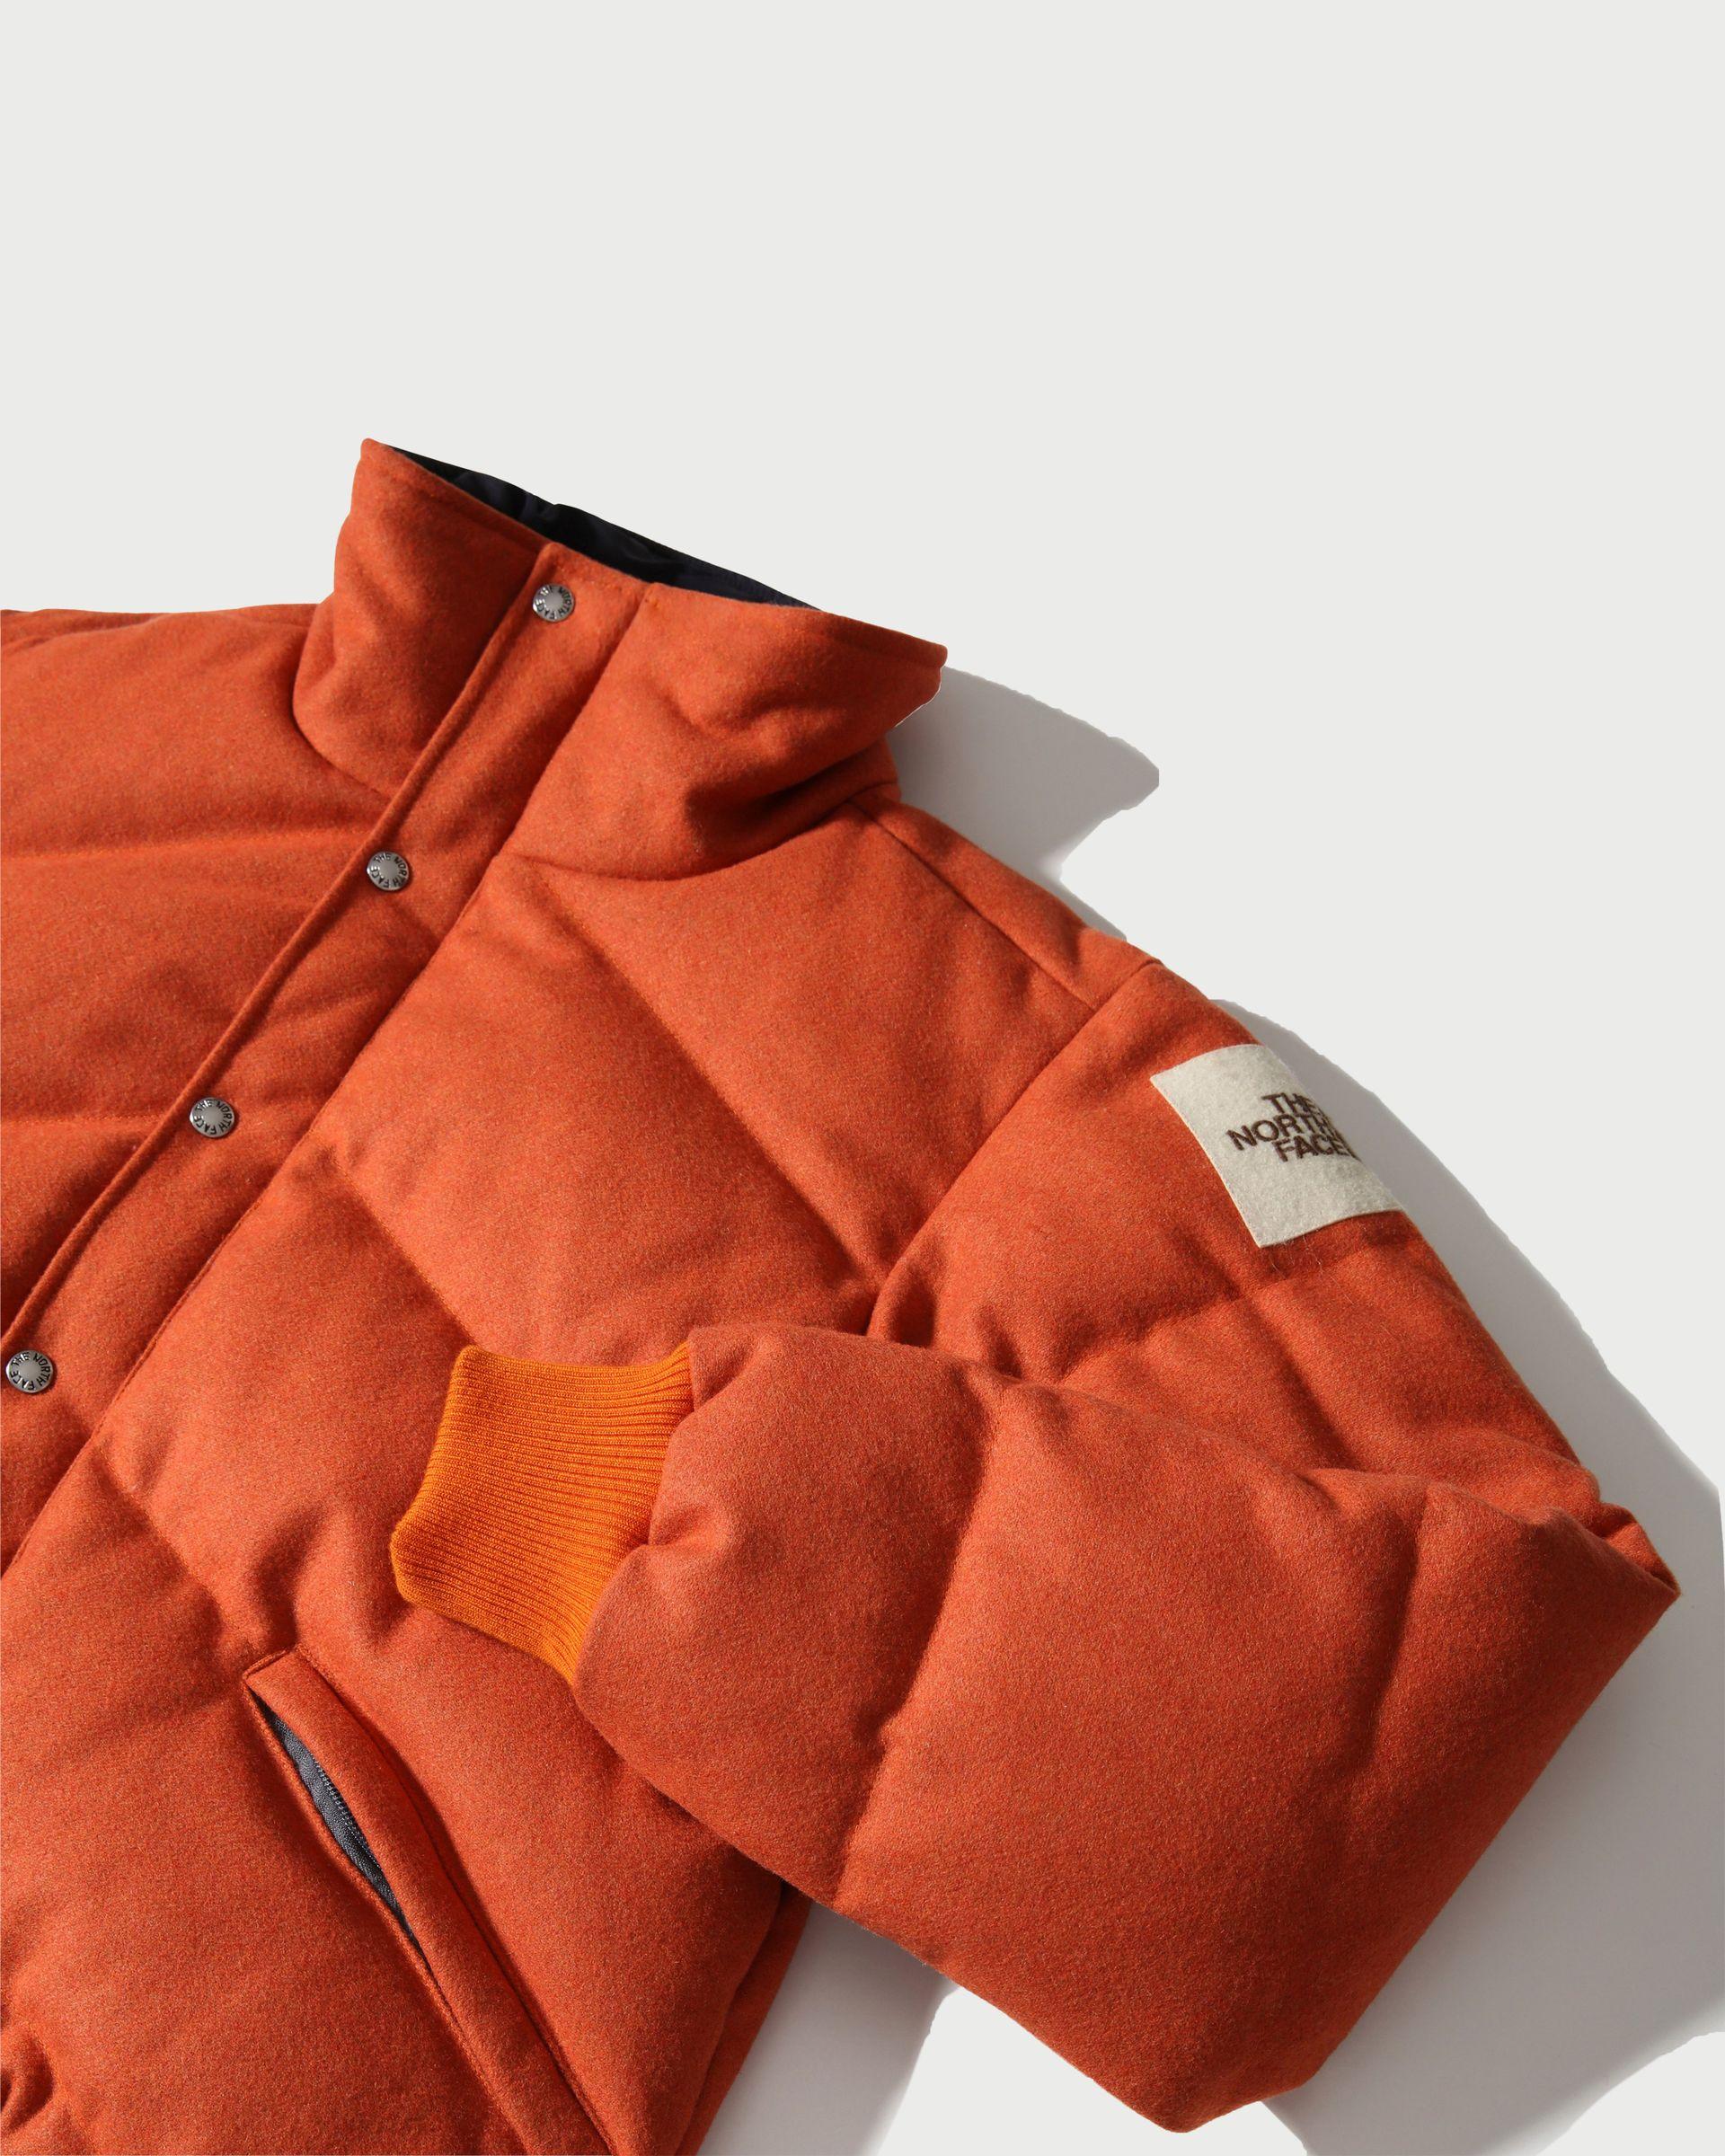 The North Face Brown Label - Larkspur Wool Down Jacket Heritage Orange Men - Image 3